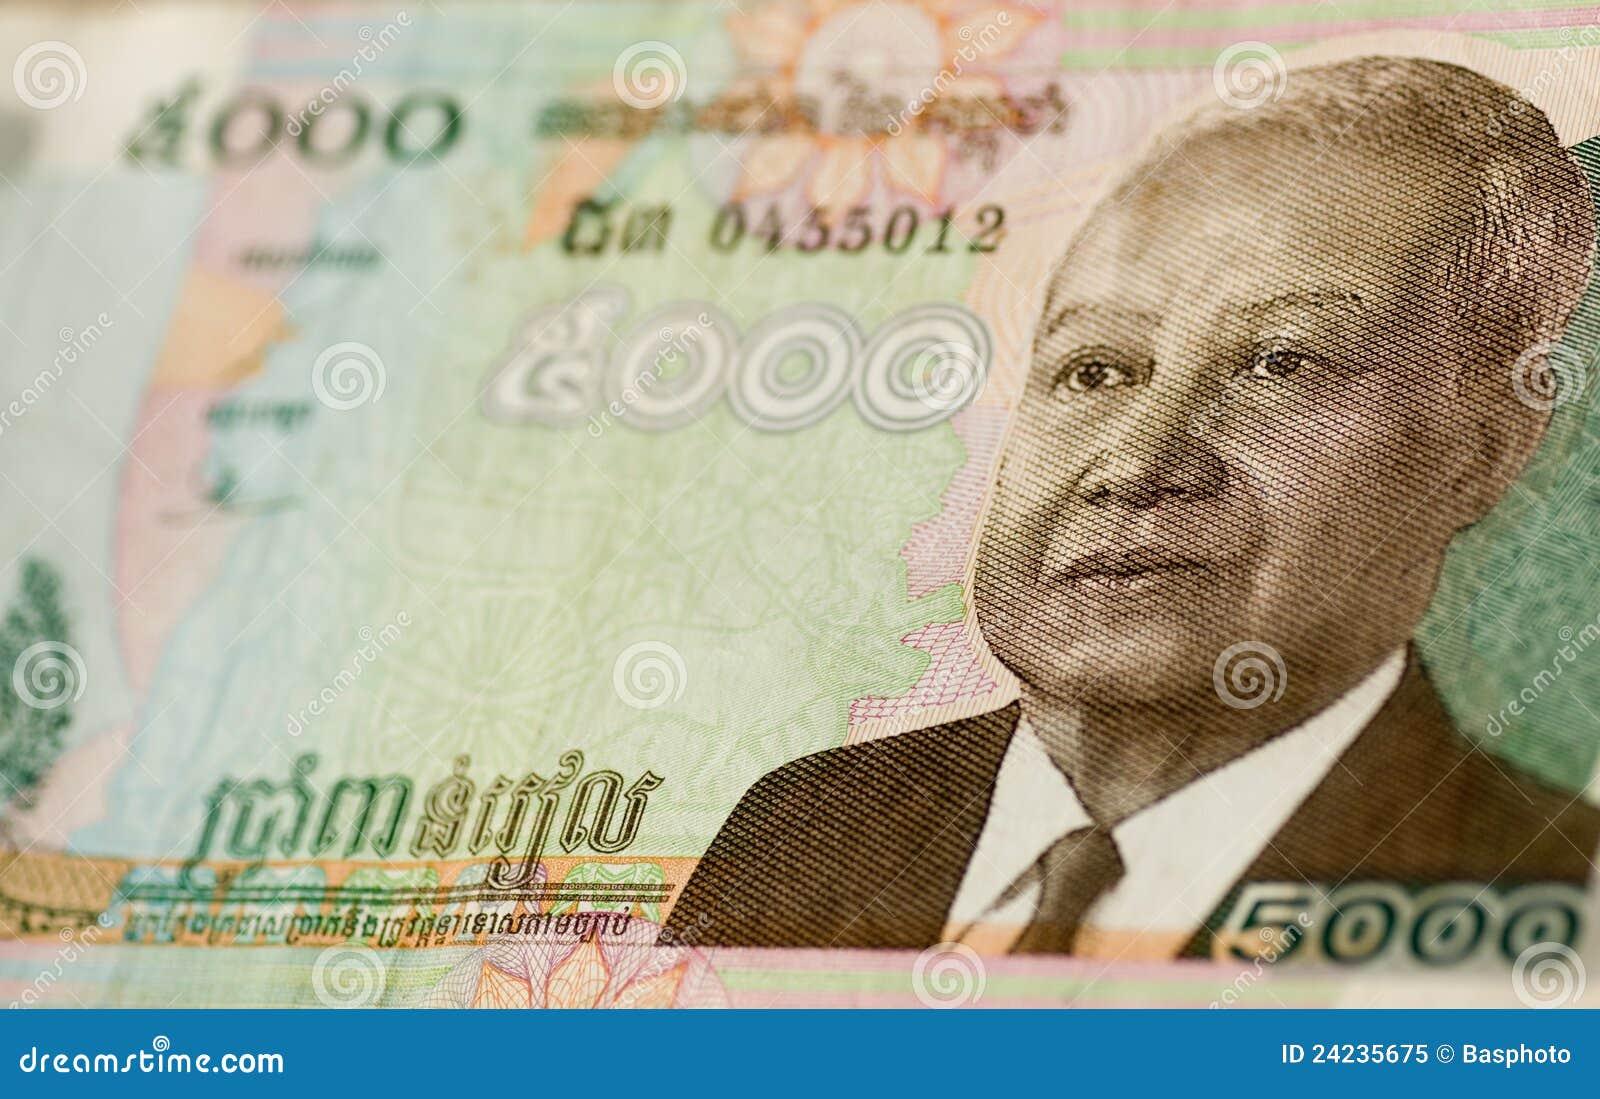 Norodom Sihanouk rey norodom sihanouk